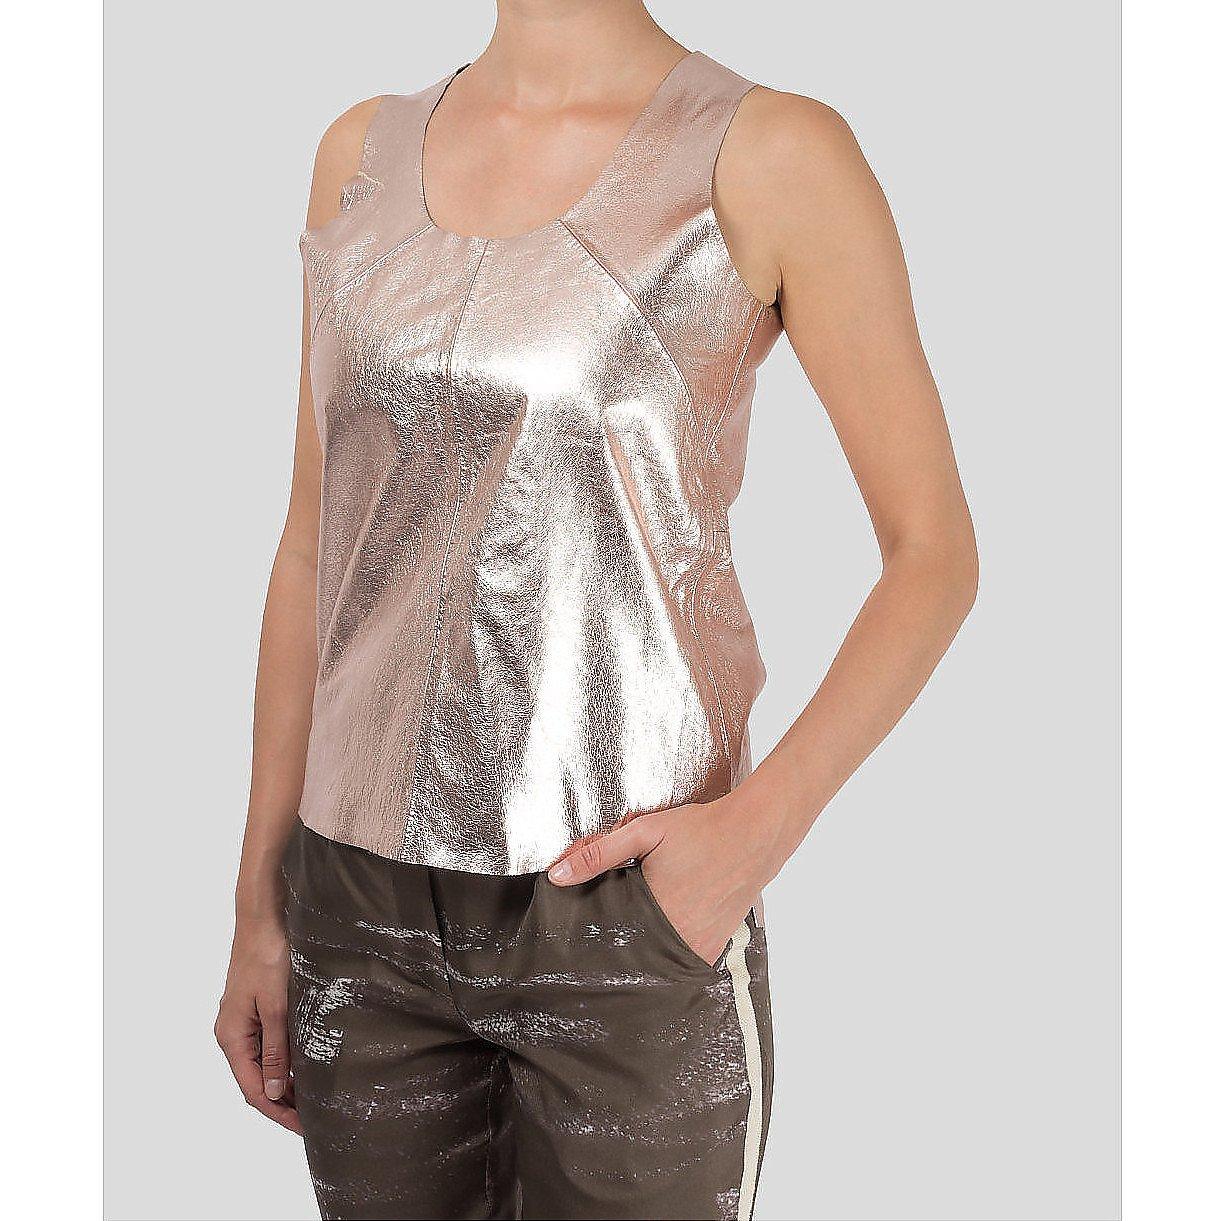 Zoe Jordan Metallic Leather Top